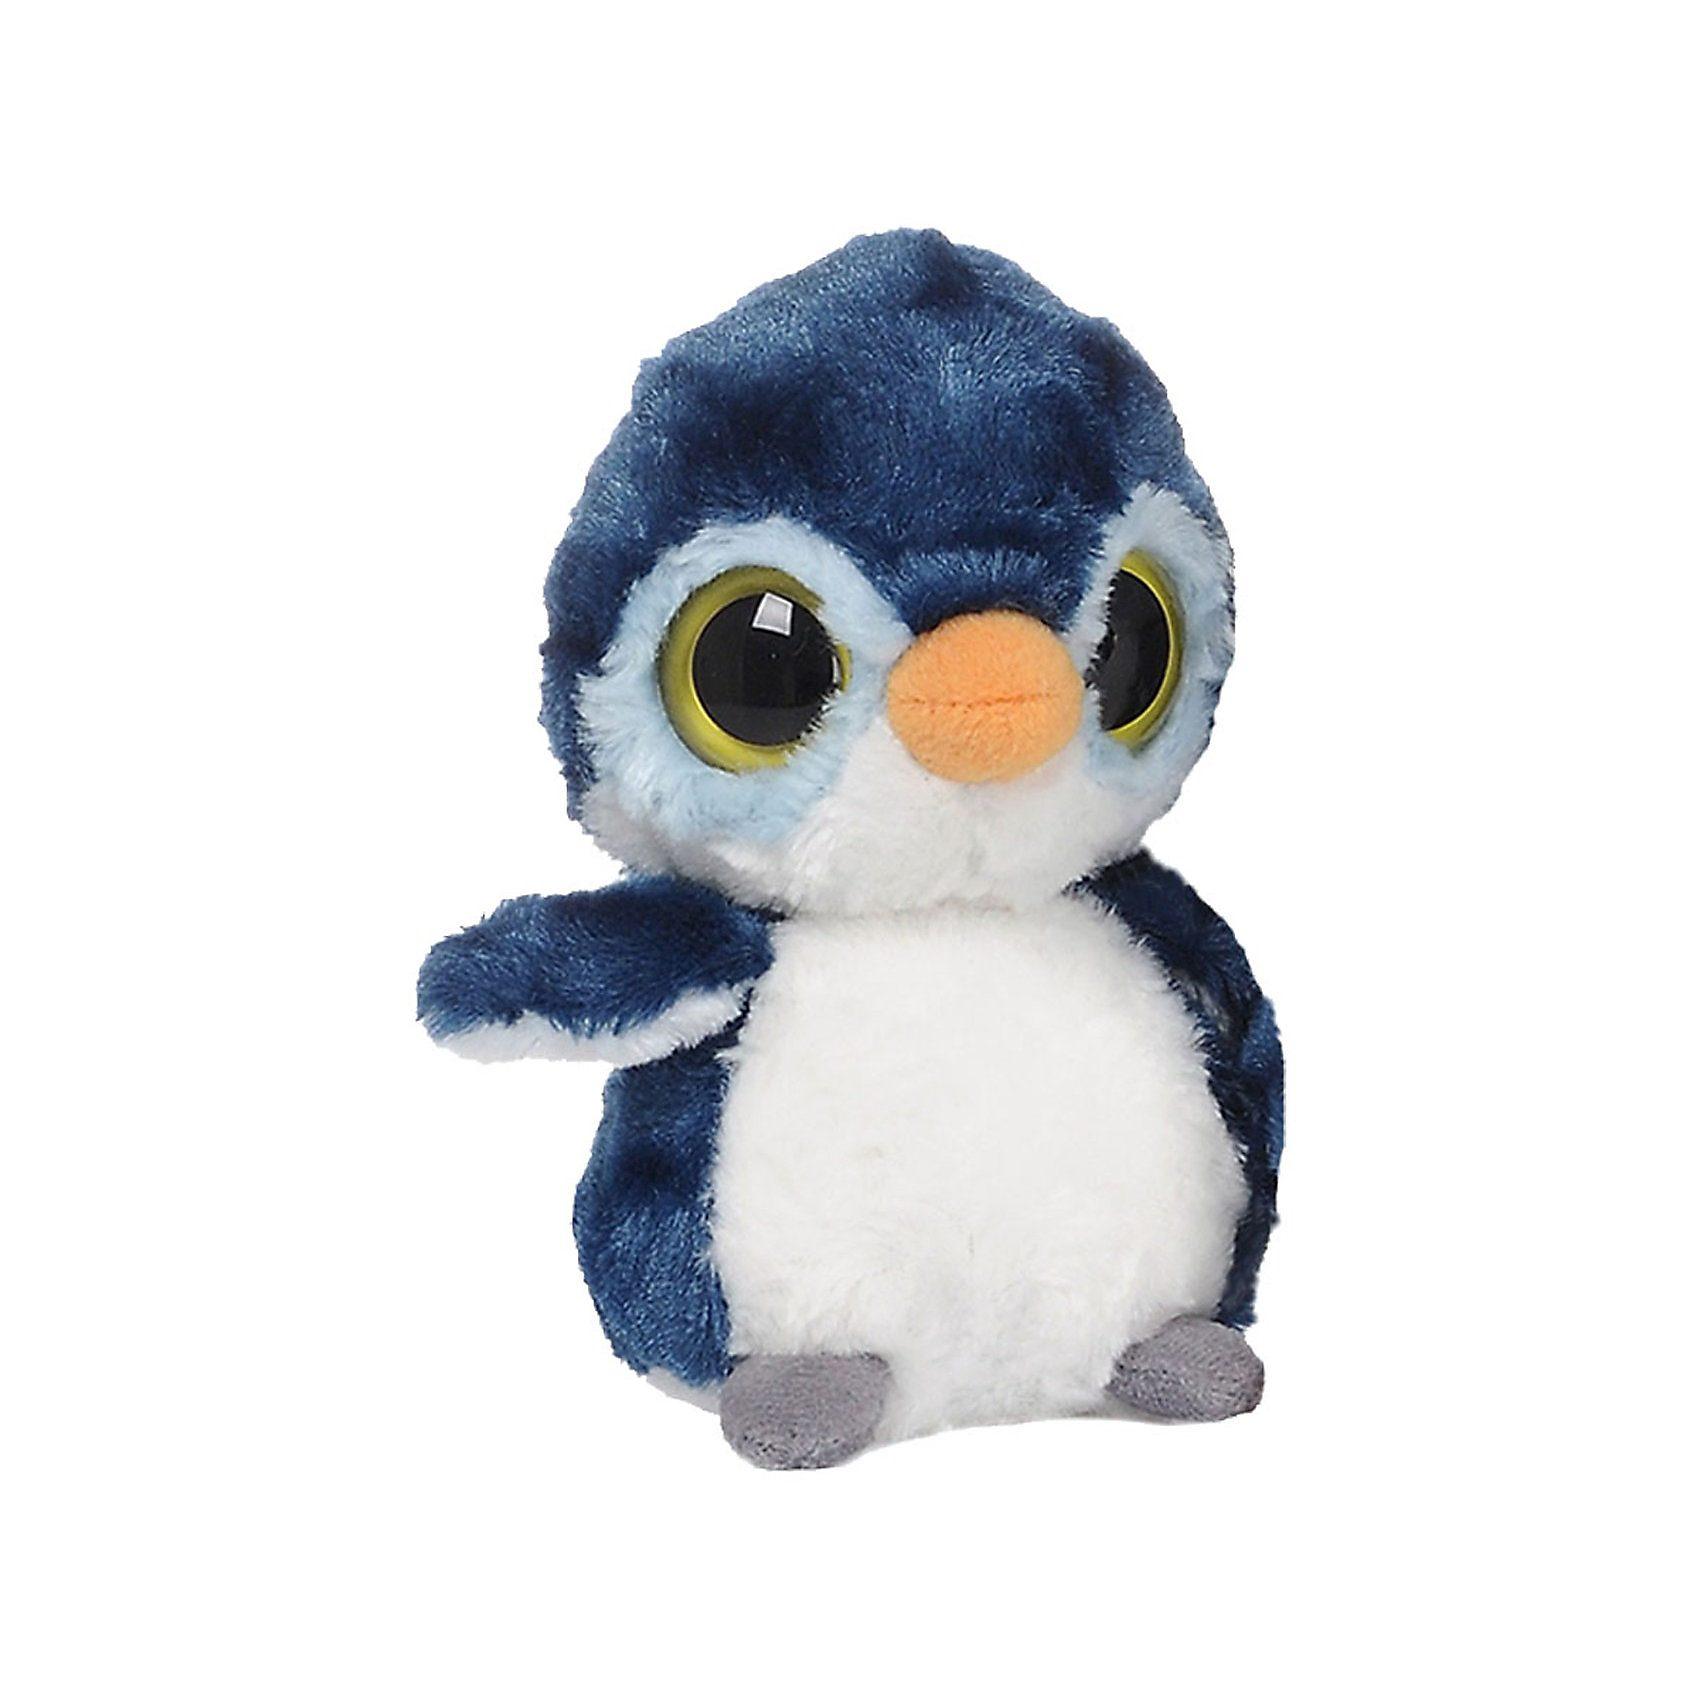 YooHoo & Friends Pinguin 12 cm